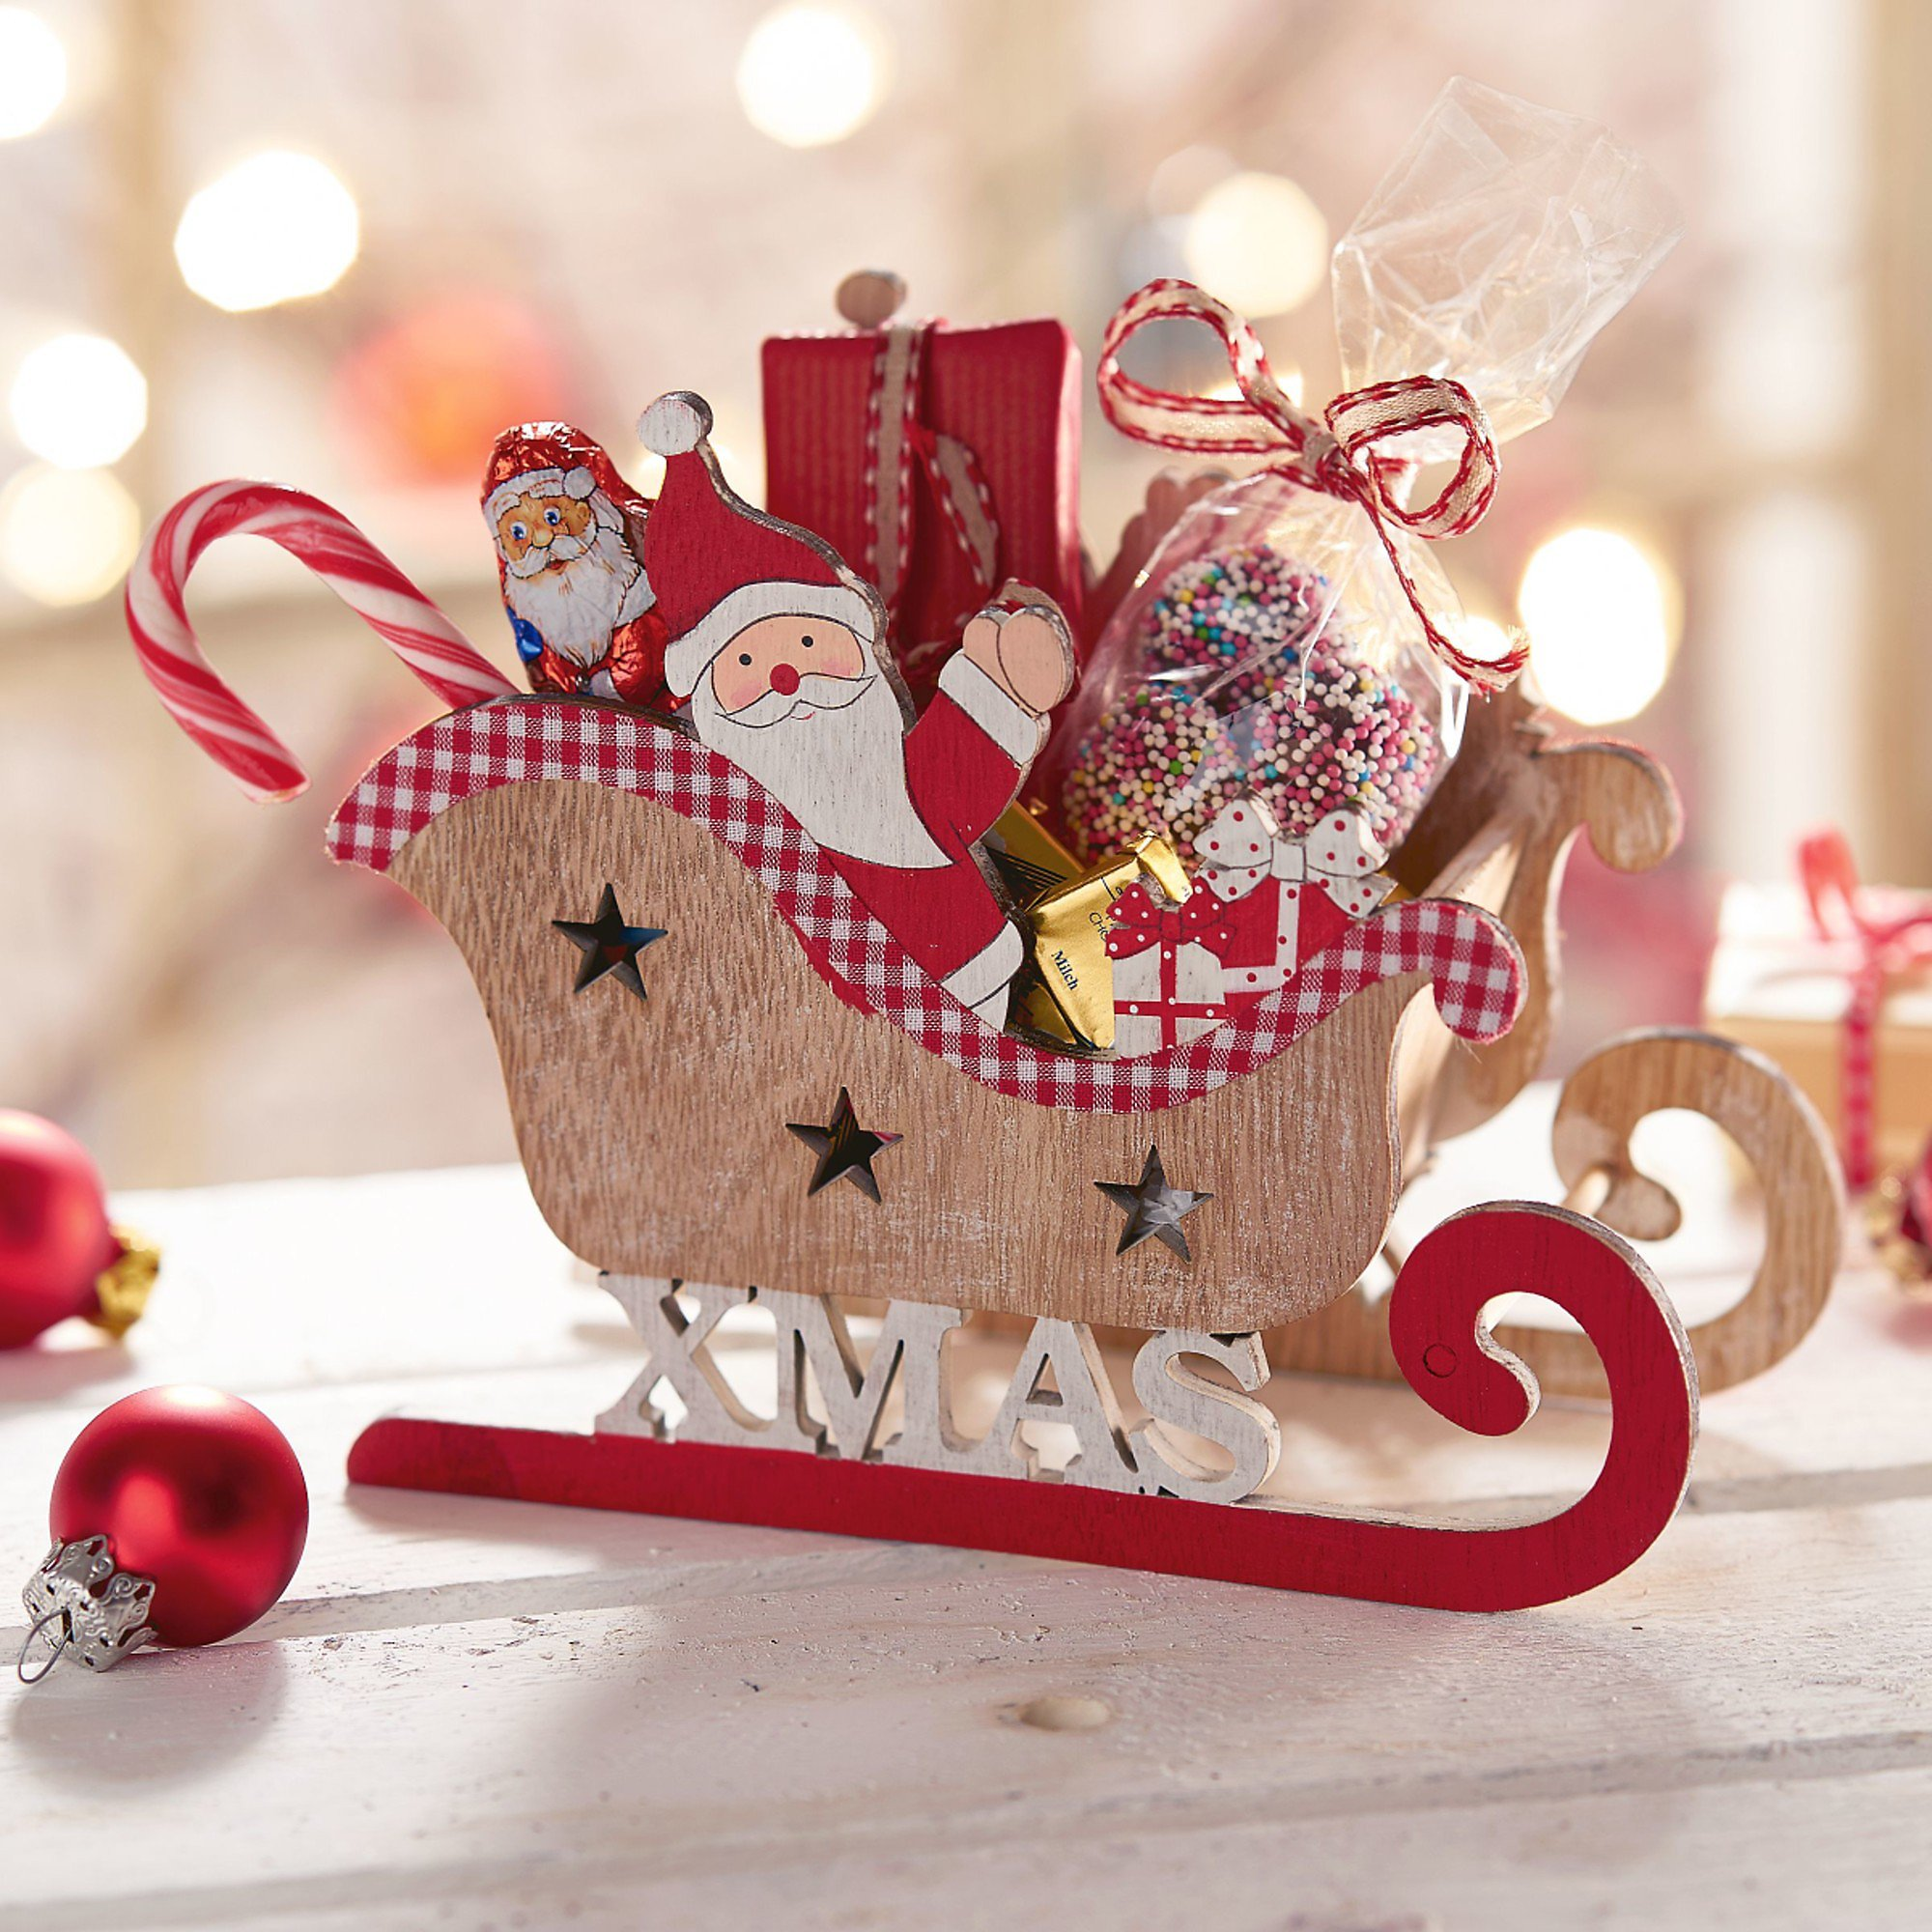 Deko-Objekt Weihnachtsschlitten Santa bestellen | Weltbild.de